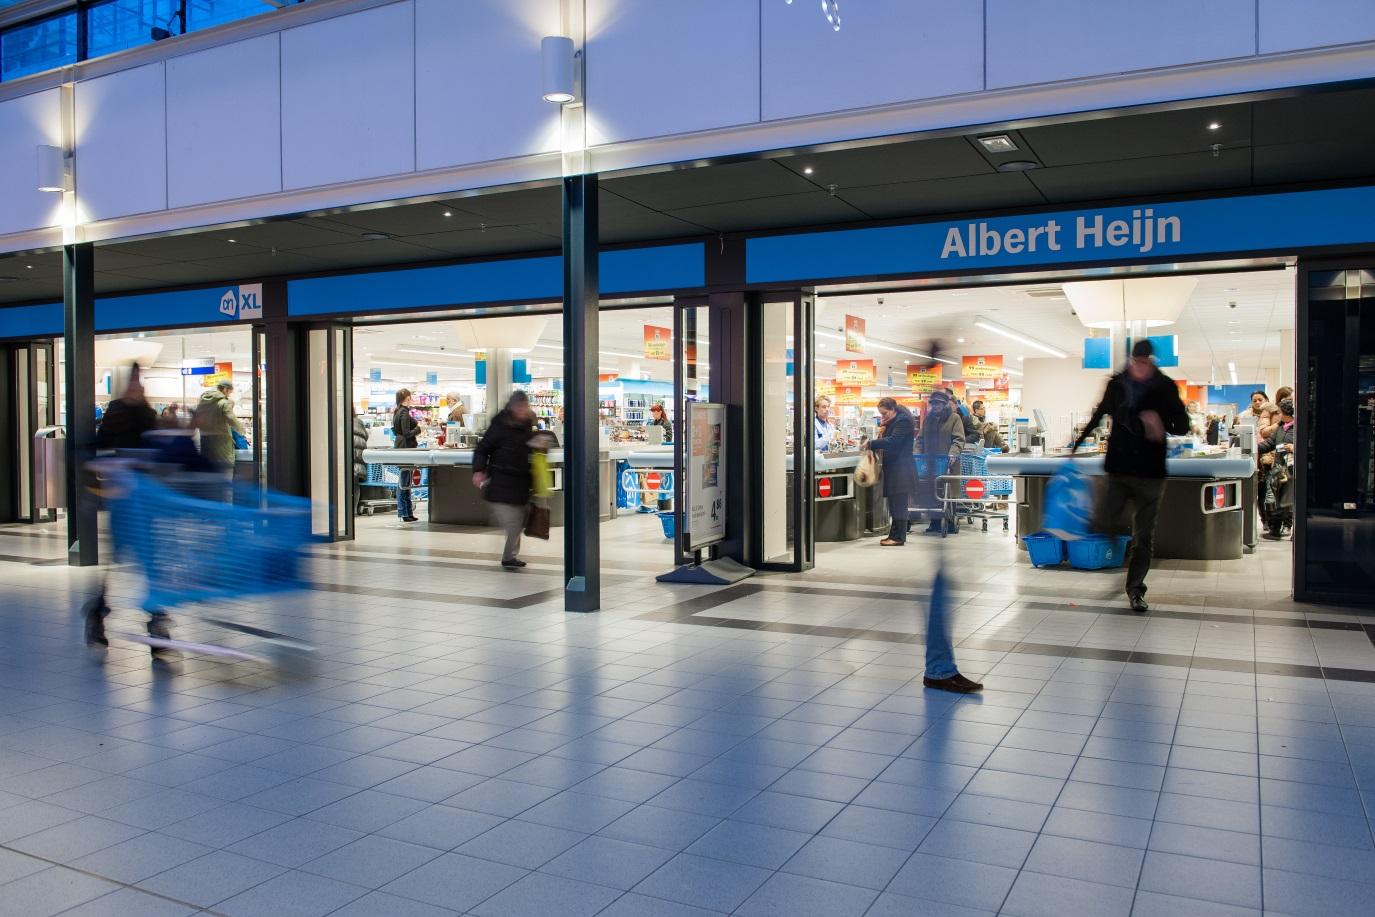 Albert_Heijn_XL-fusie-delhaize-rond-ahold-zakenservice